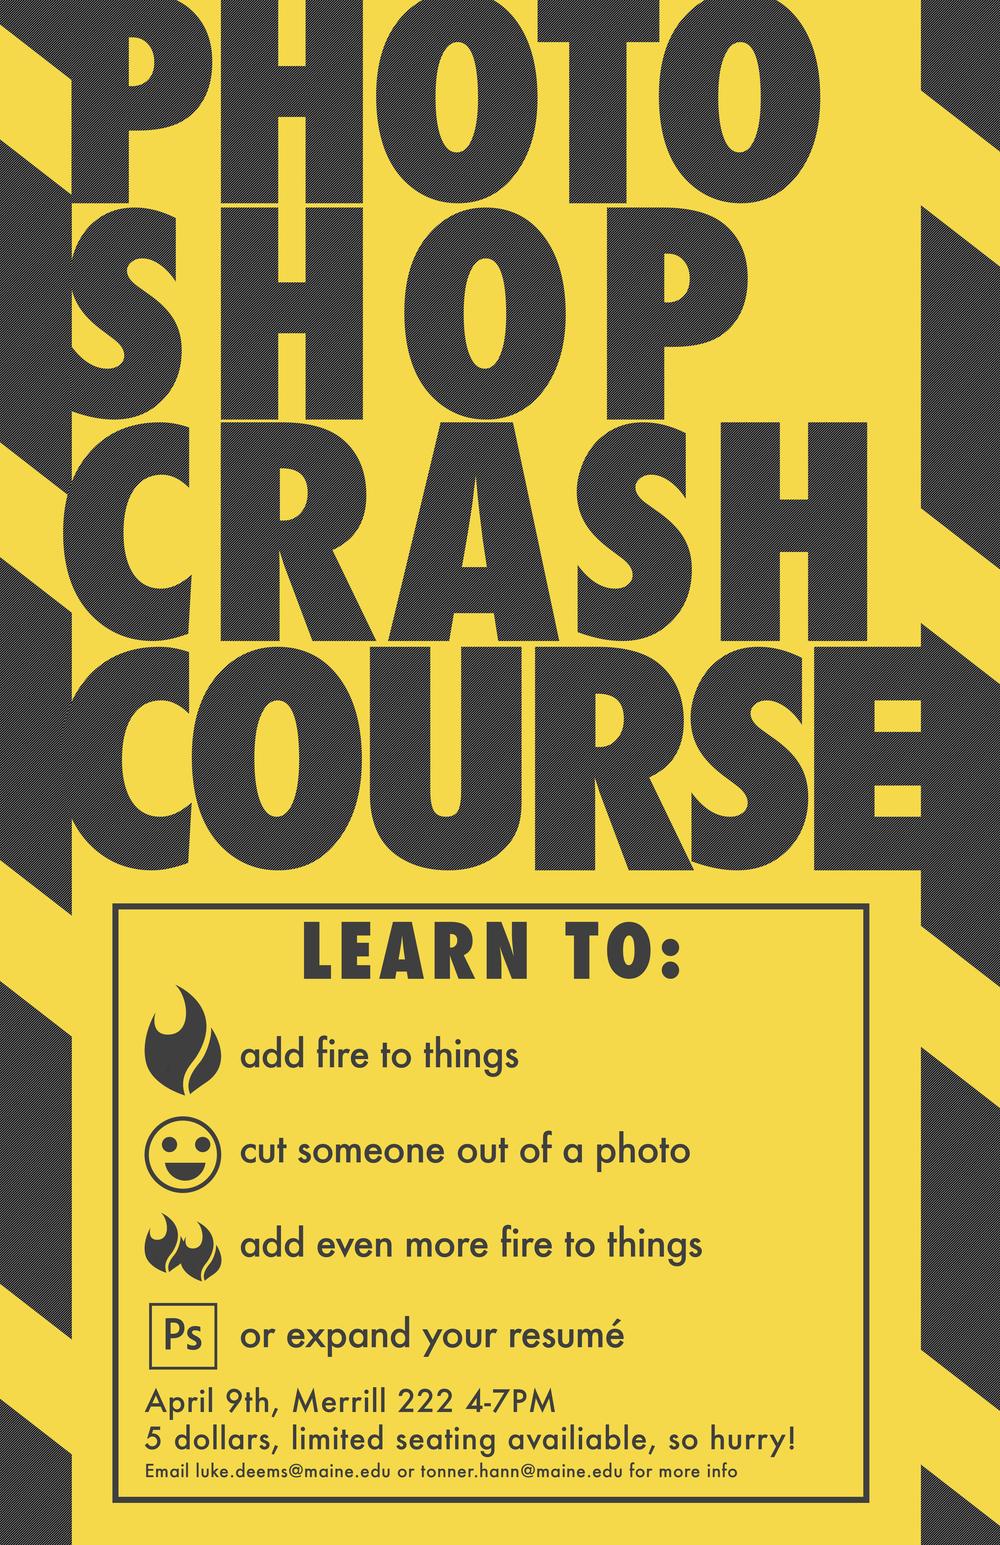 crashcourseposterv2.jpg